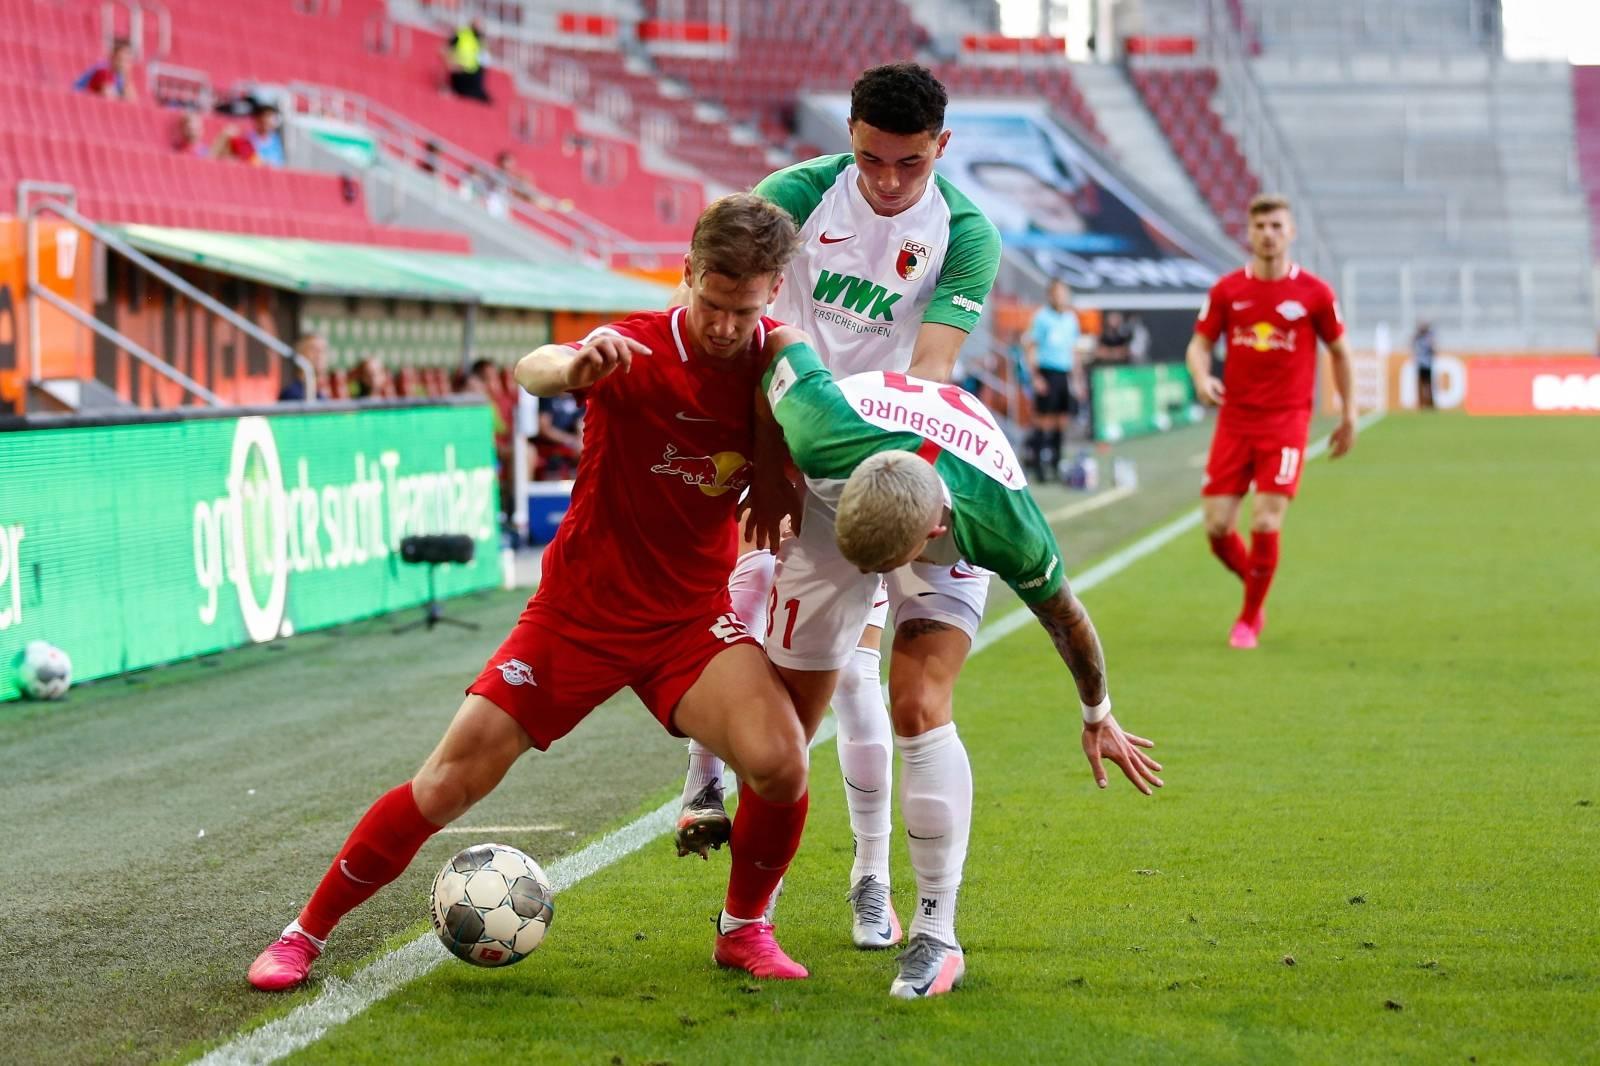 Soccer: Fuvuball: 06/27/2020 1.Bundesliga: season 19/20 34th matchday: FC Augsburg - RB Leipzig